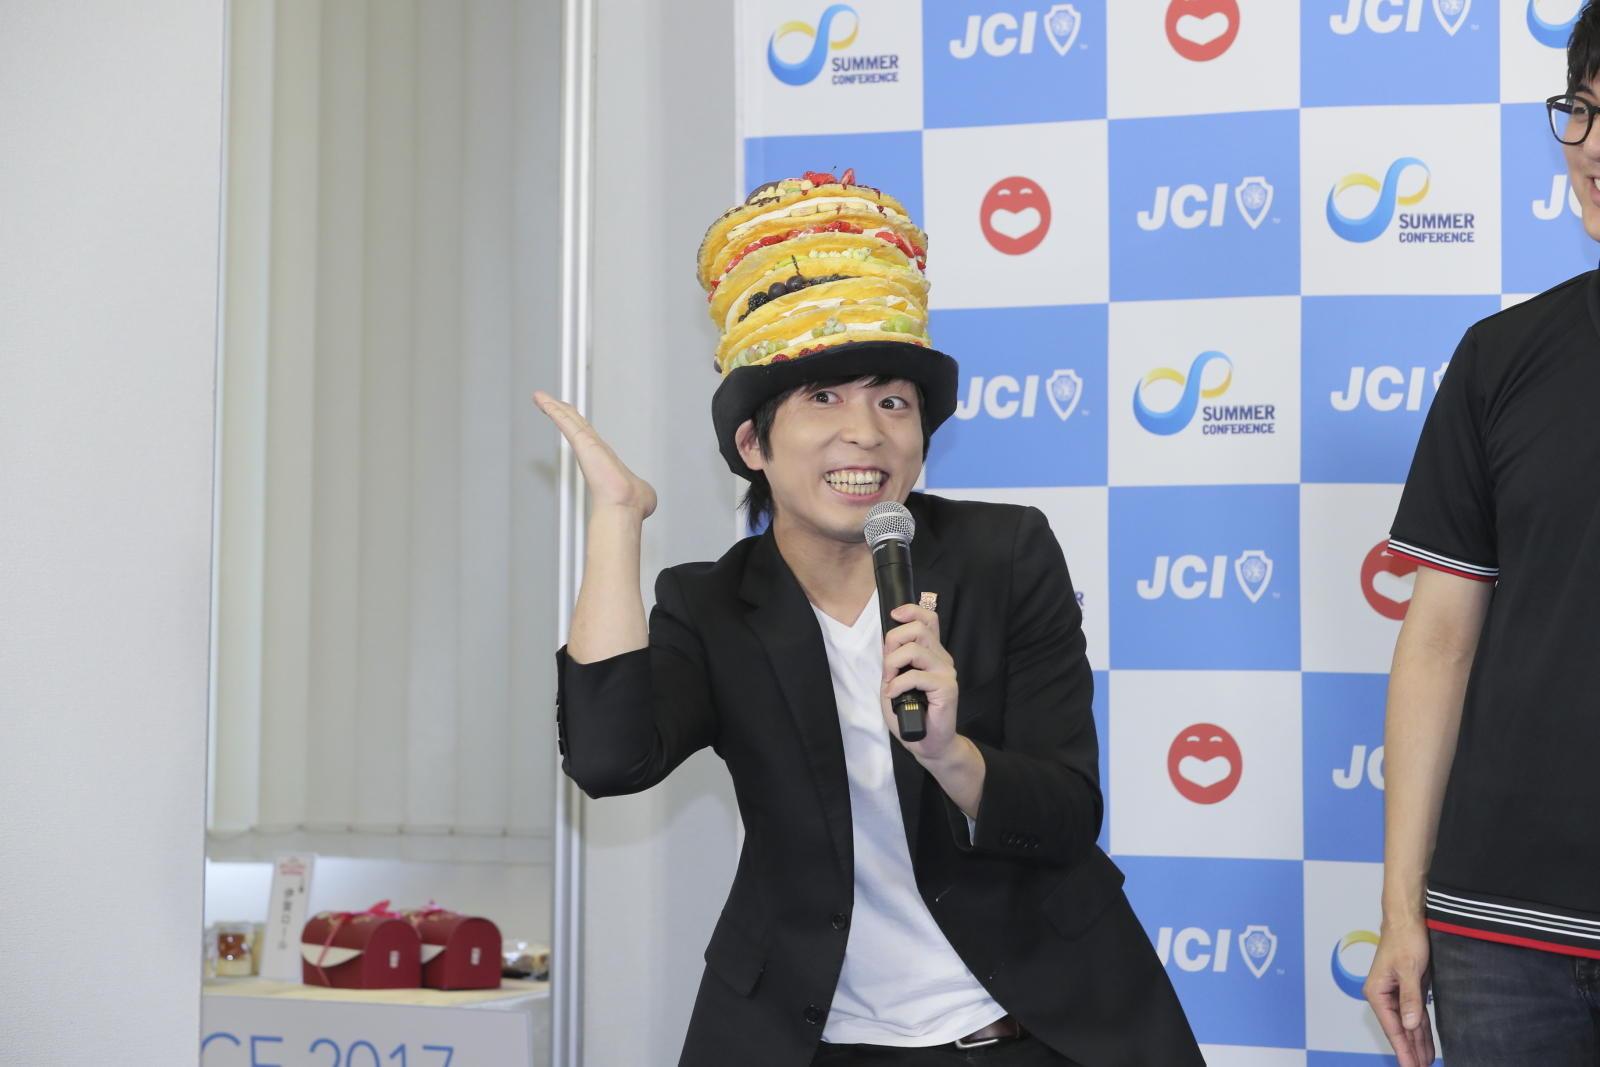 http://news.yoshimoto.co.jp/20170714133520-c3a239e9bcd0484b643c190dae197cbf45953386.jpg